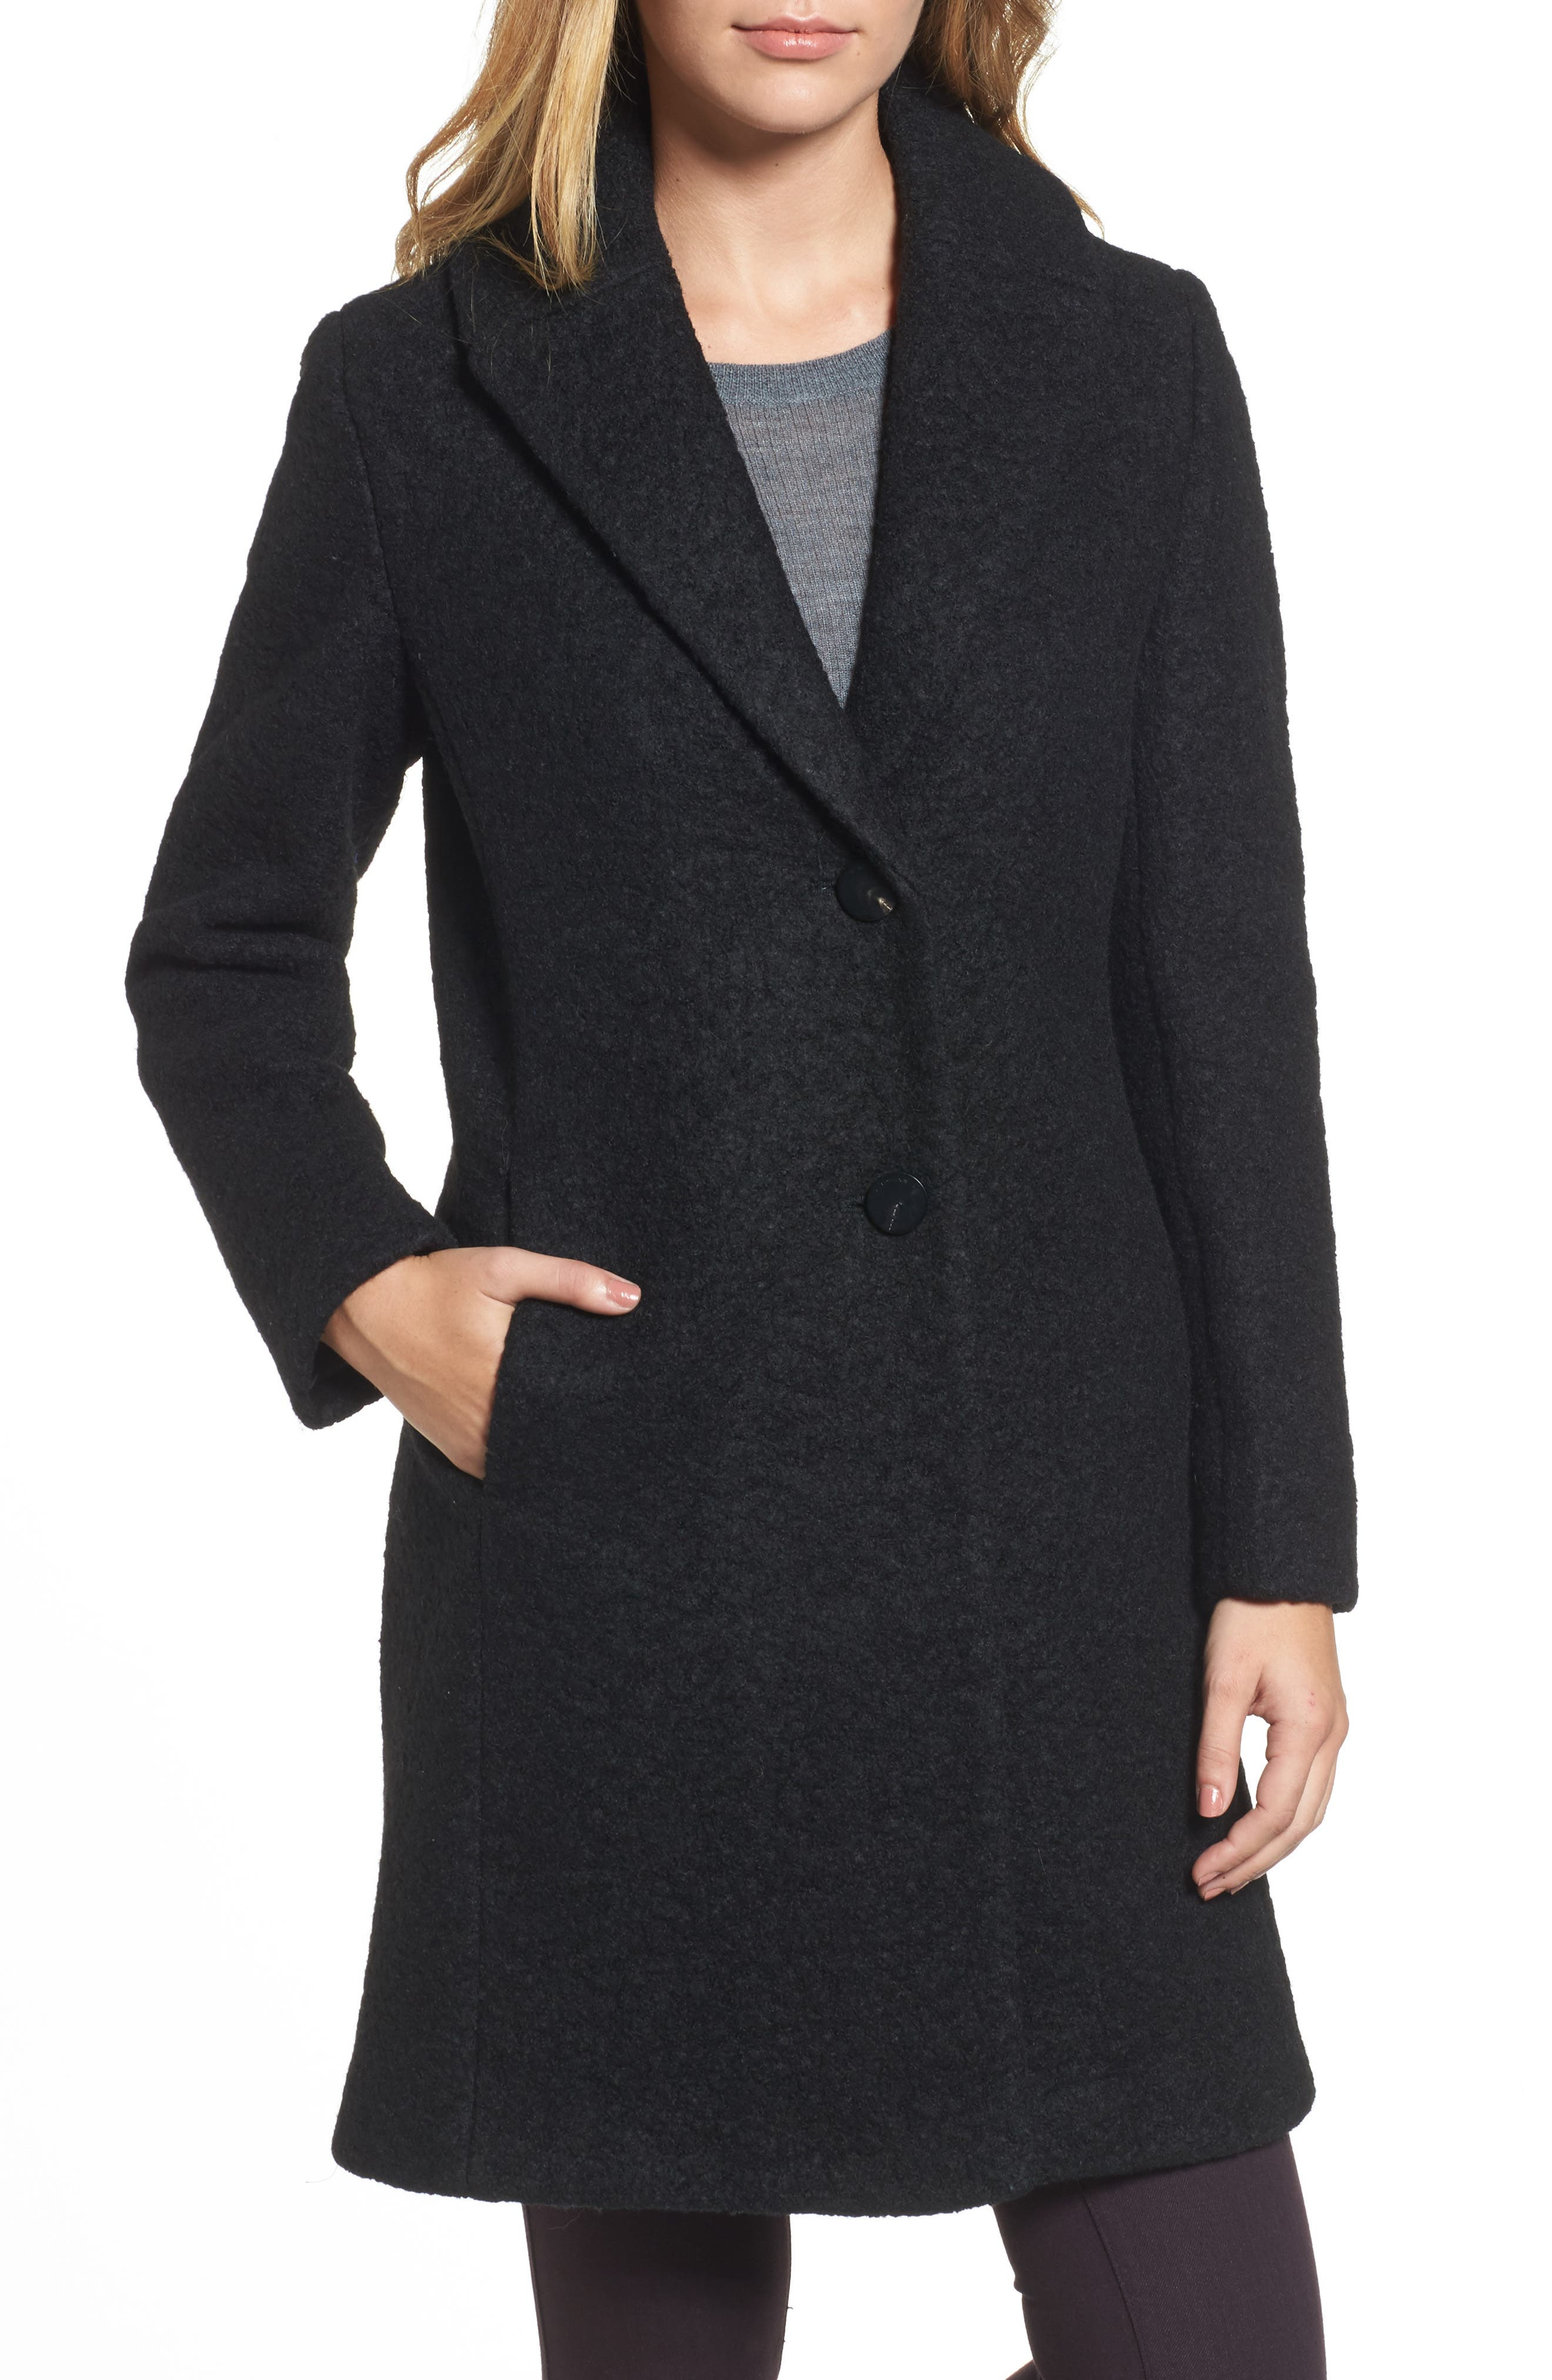 'Tessa' Boiled Wool Blend Coat,                             Alternate thumbnail 4, color,                             001